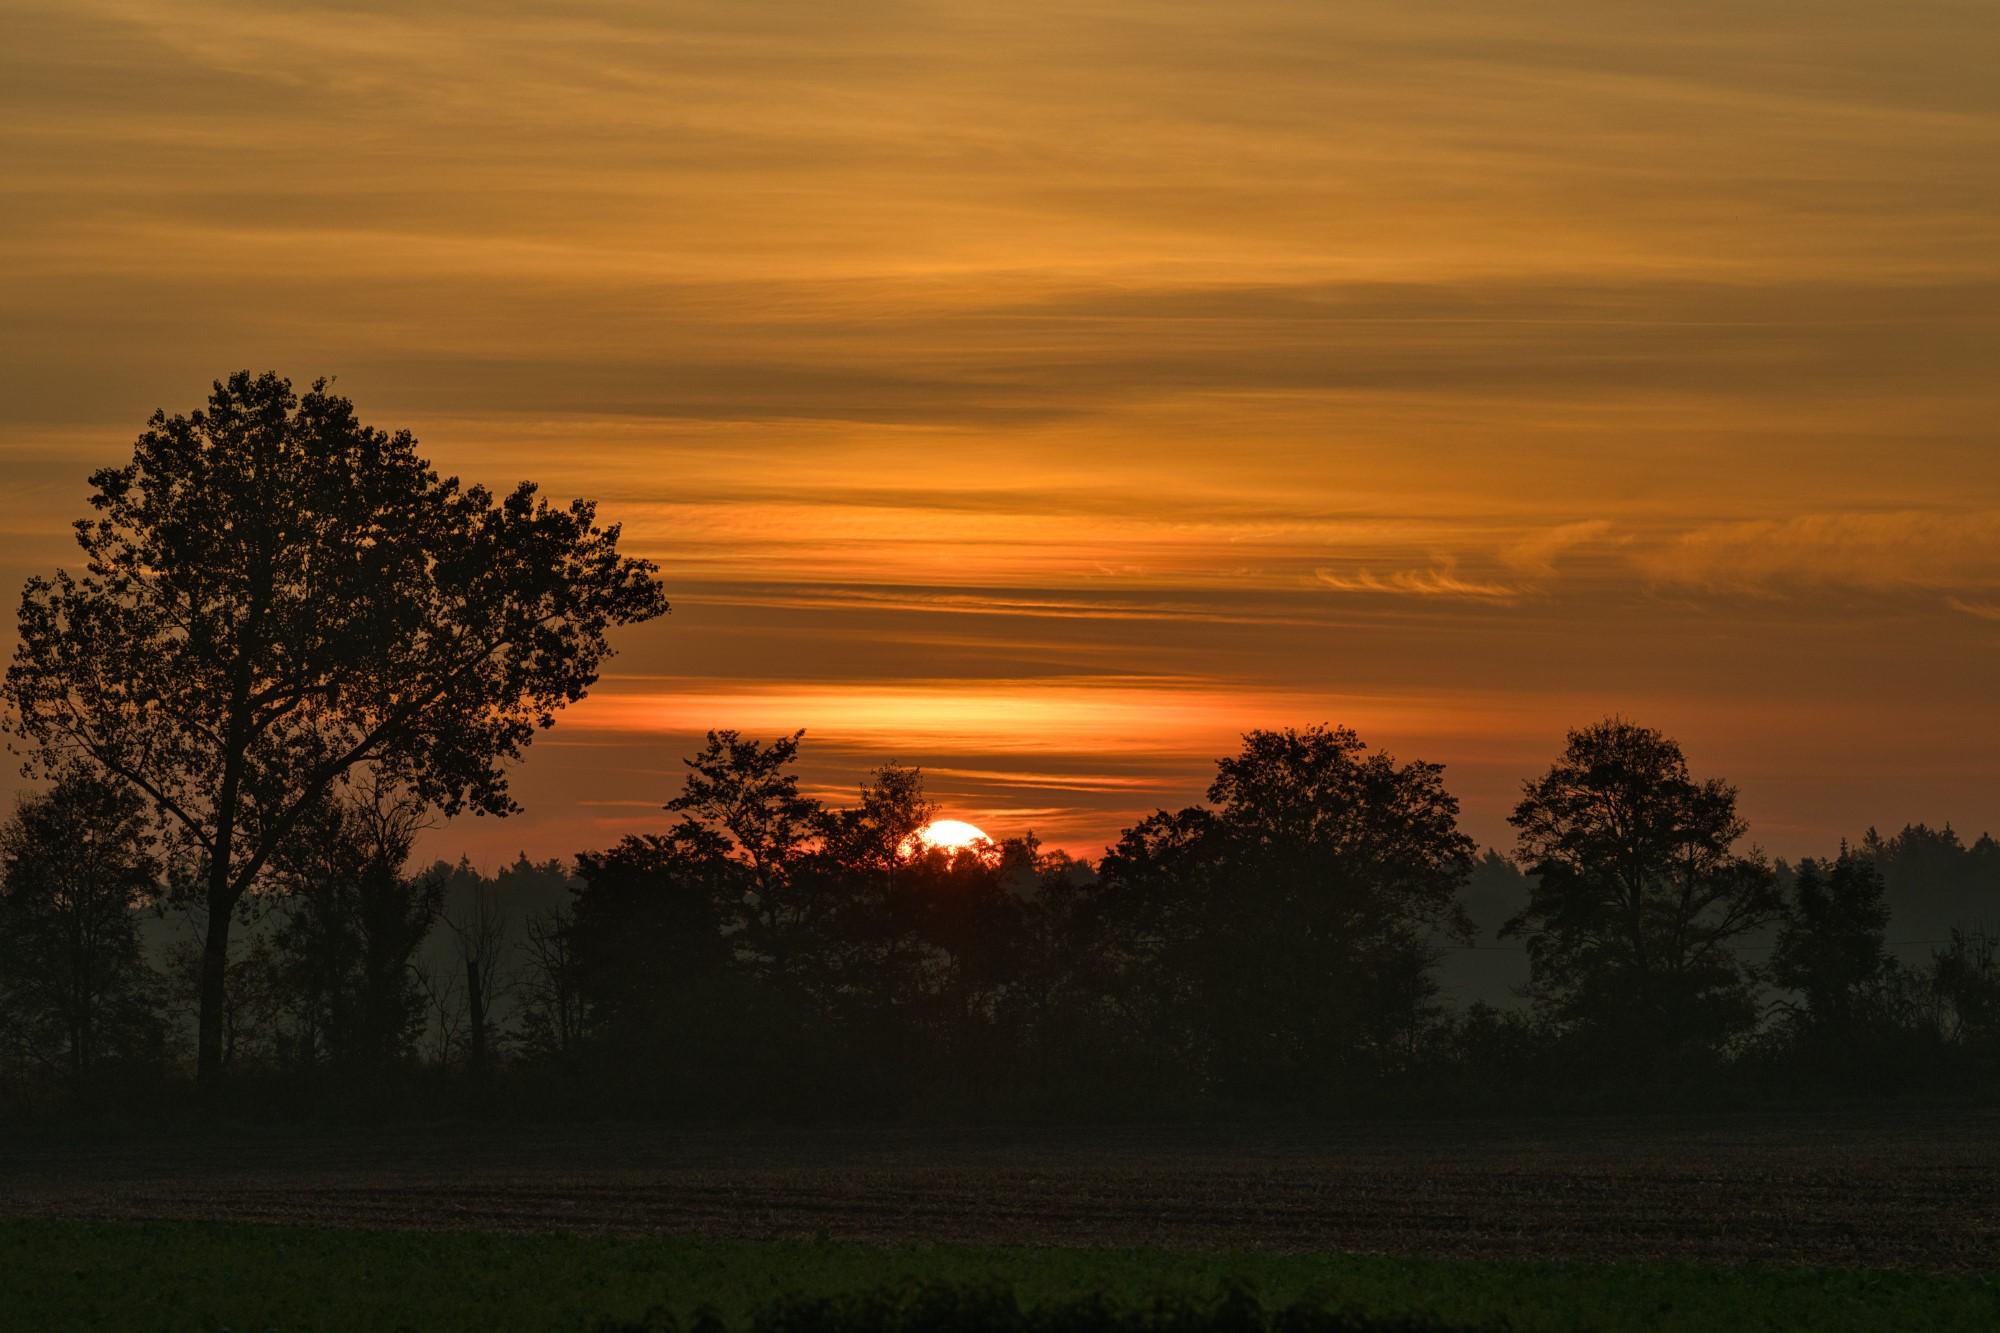 Sonnenaufgang im Moos